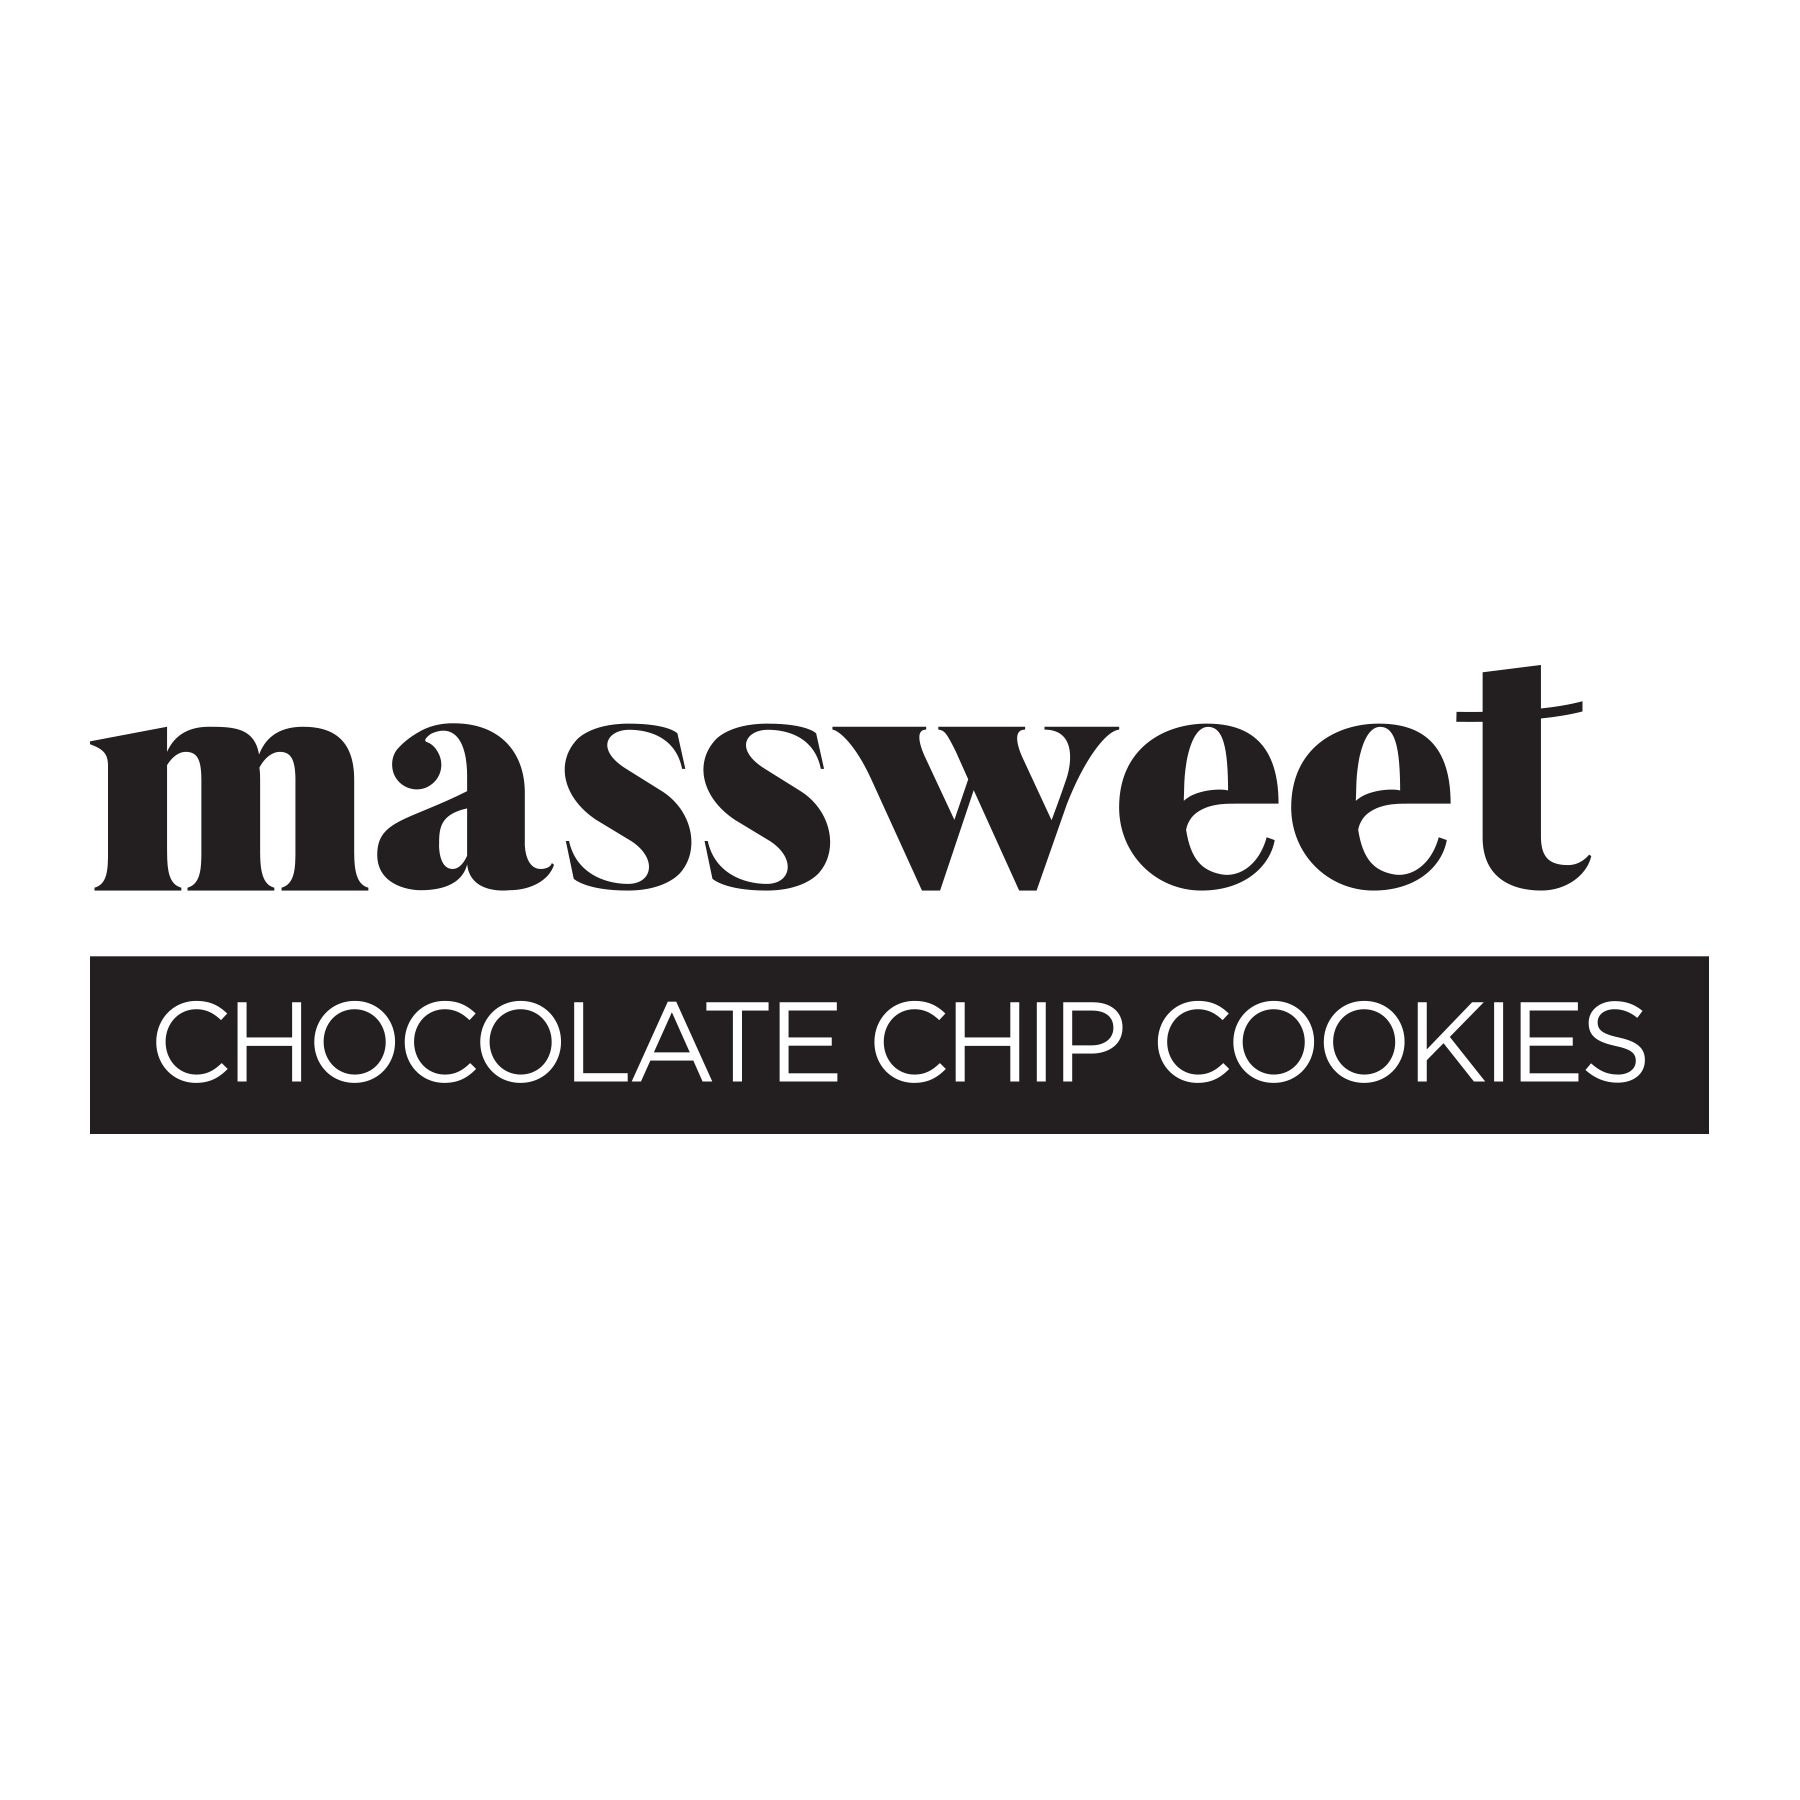 Massweet logo